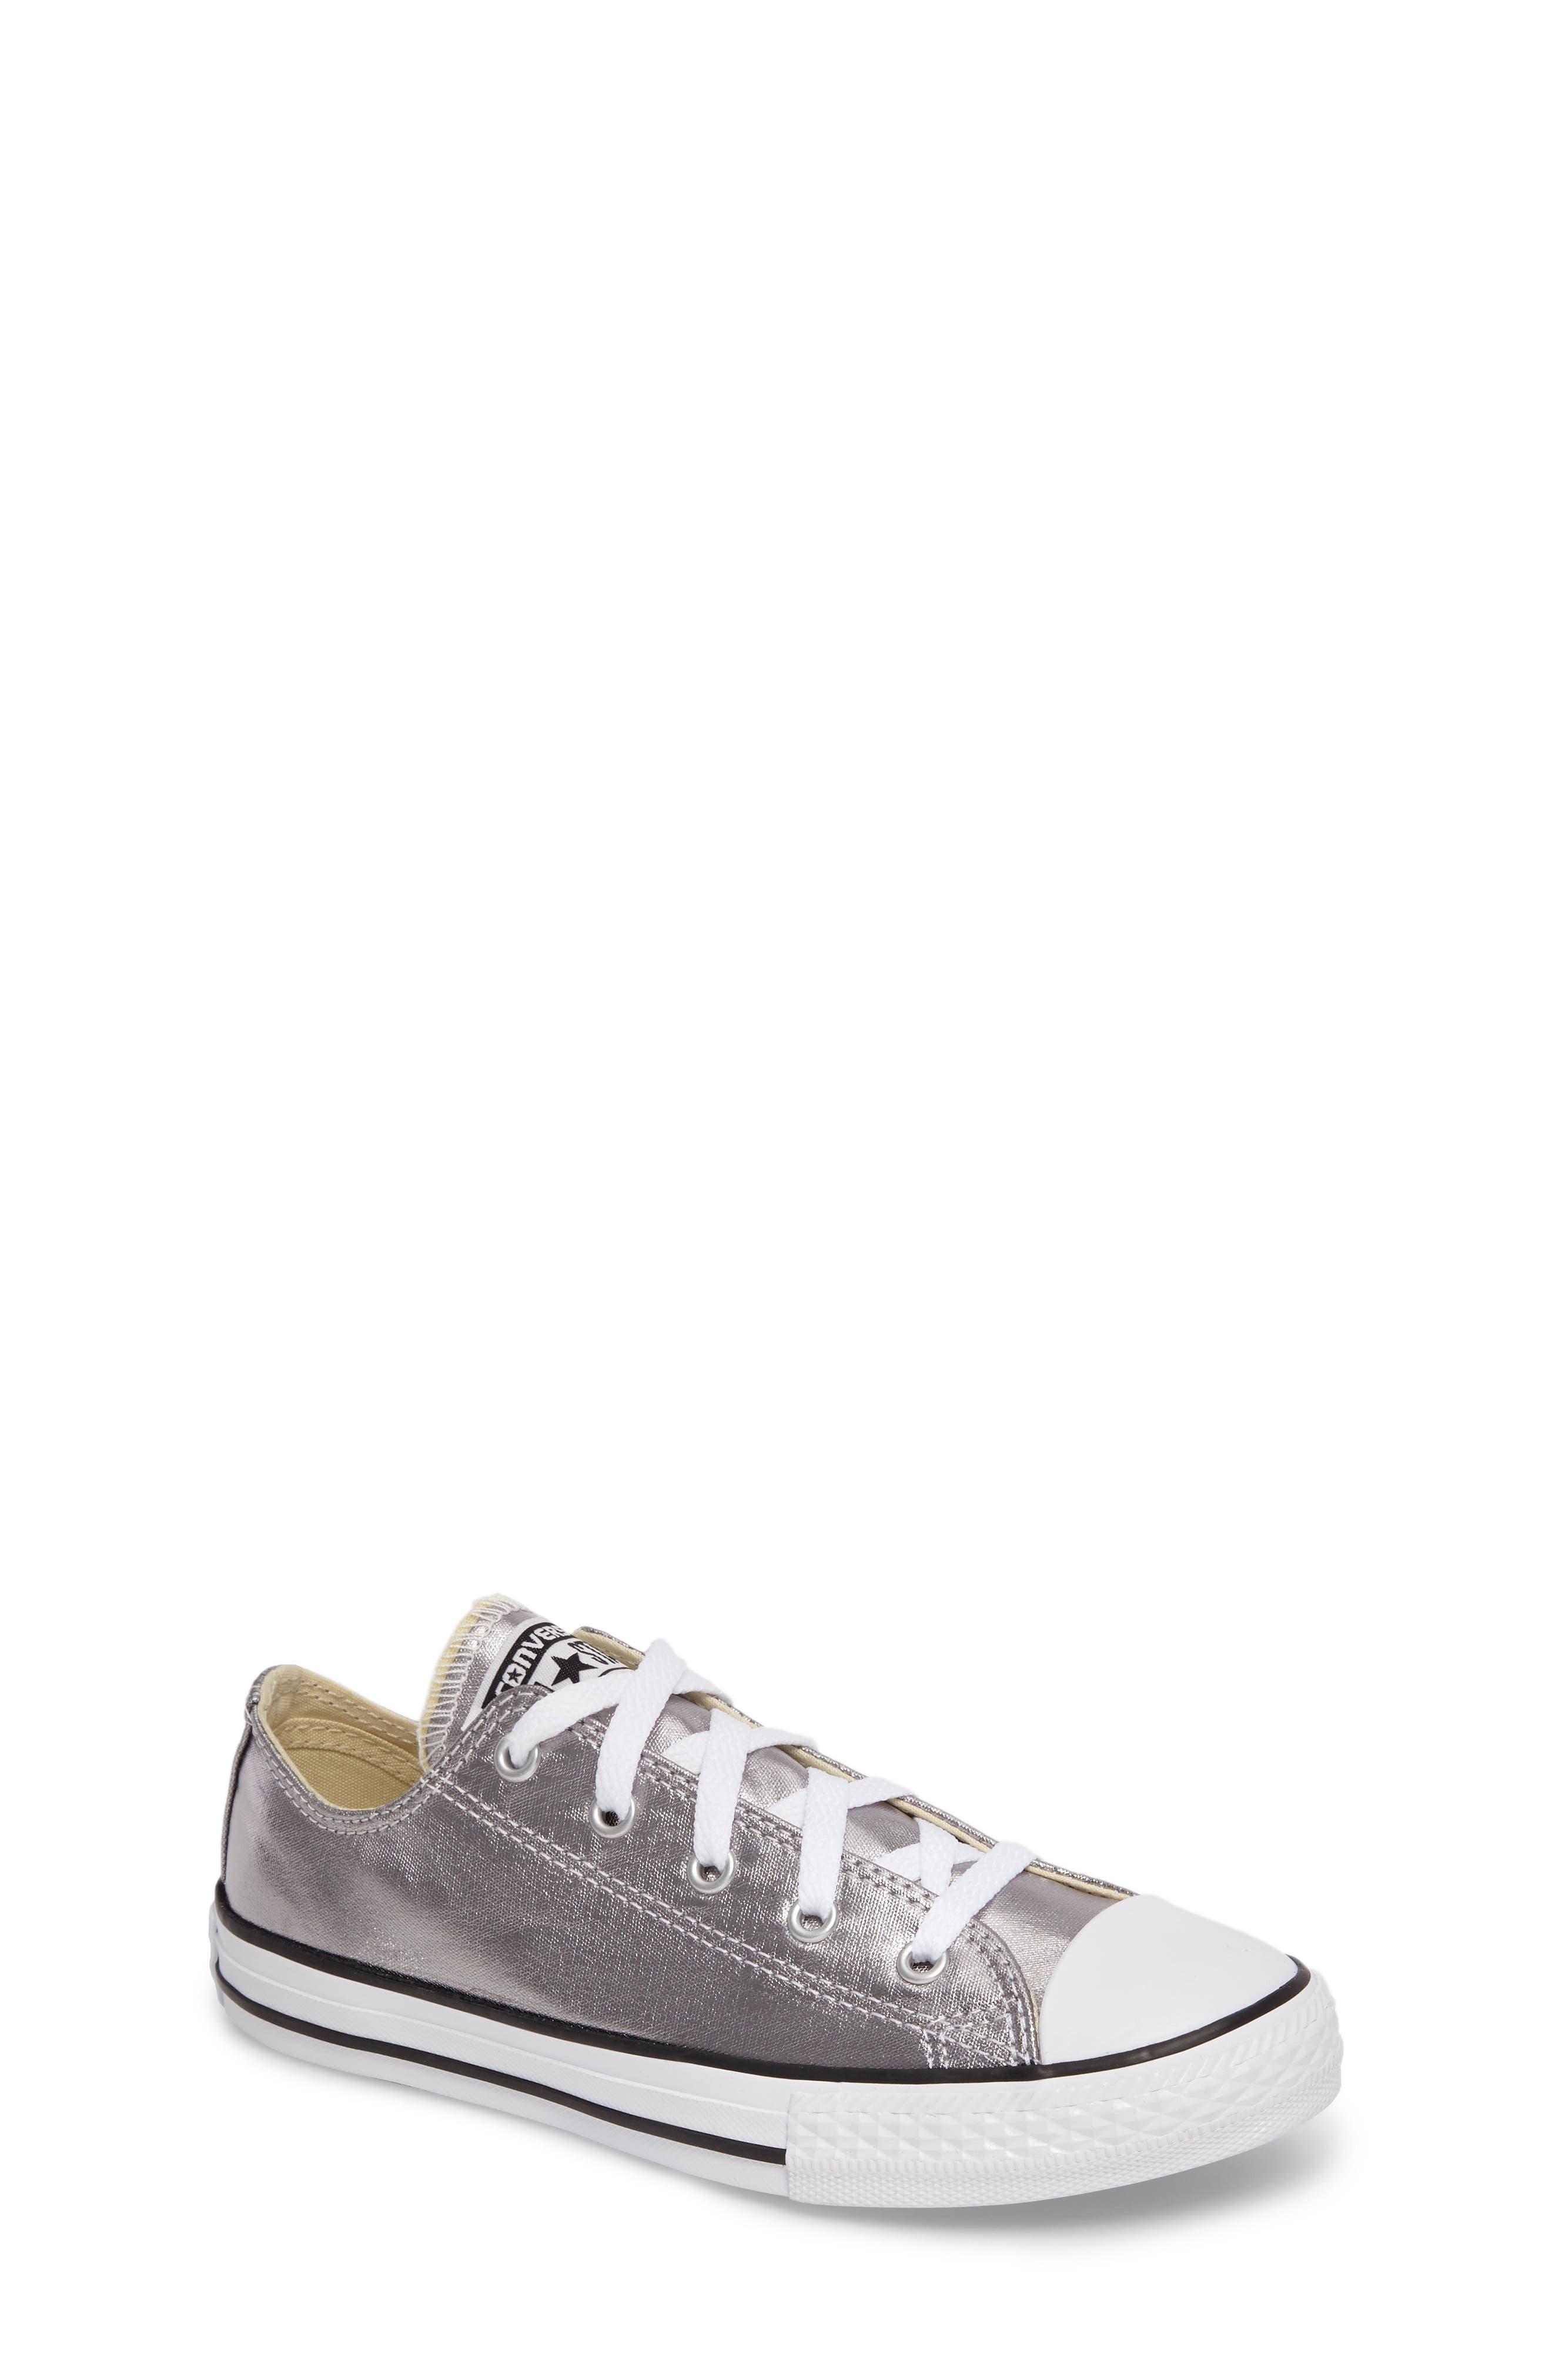 Chuck Taylor<sup>®</sup> All Star<sup>®</sup> Metallic Sneaker,                         Main,                         color, 040